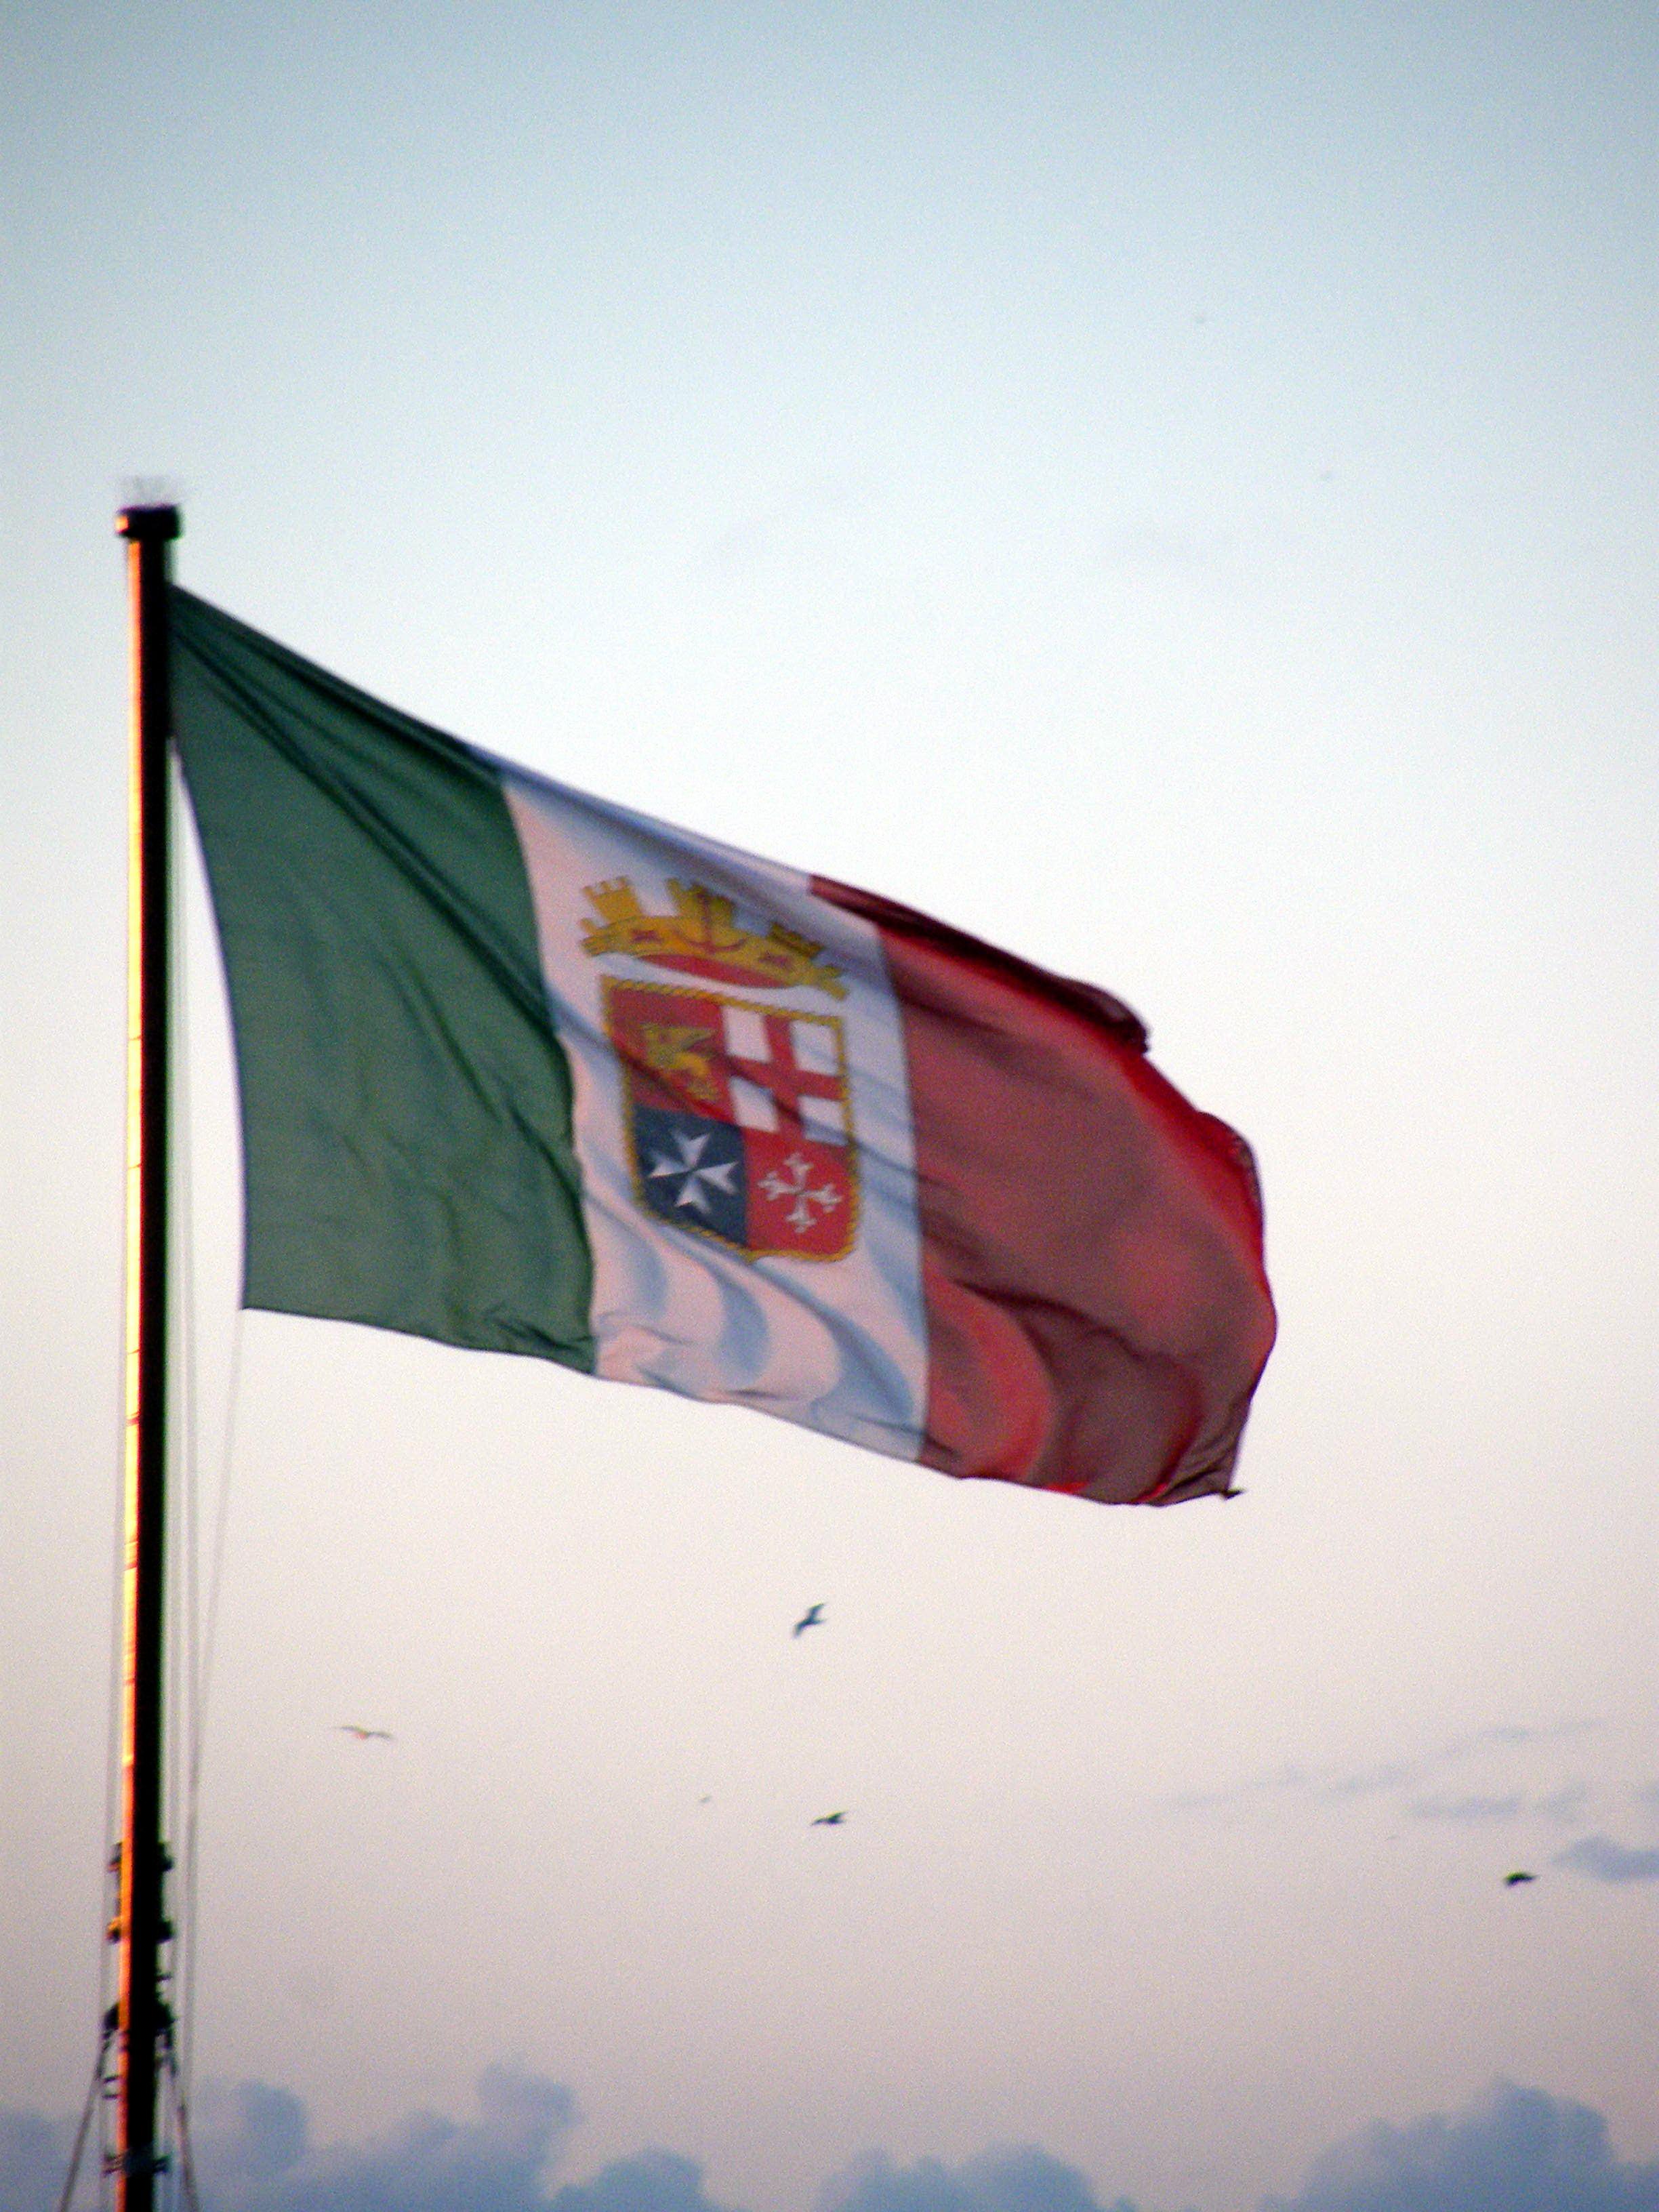 bandiera cavour